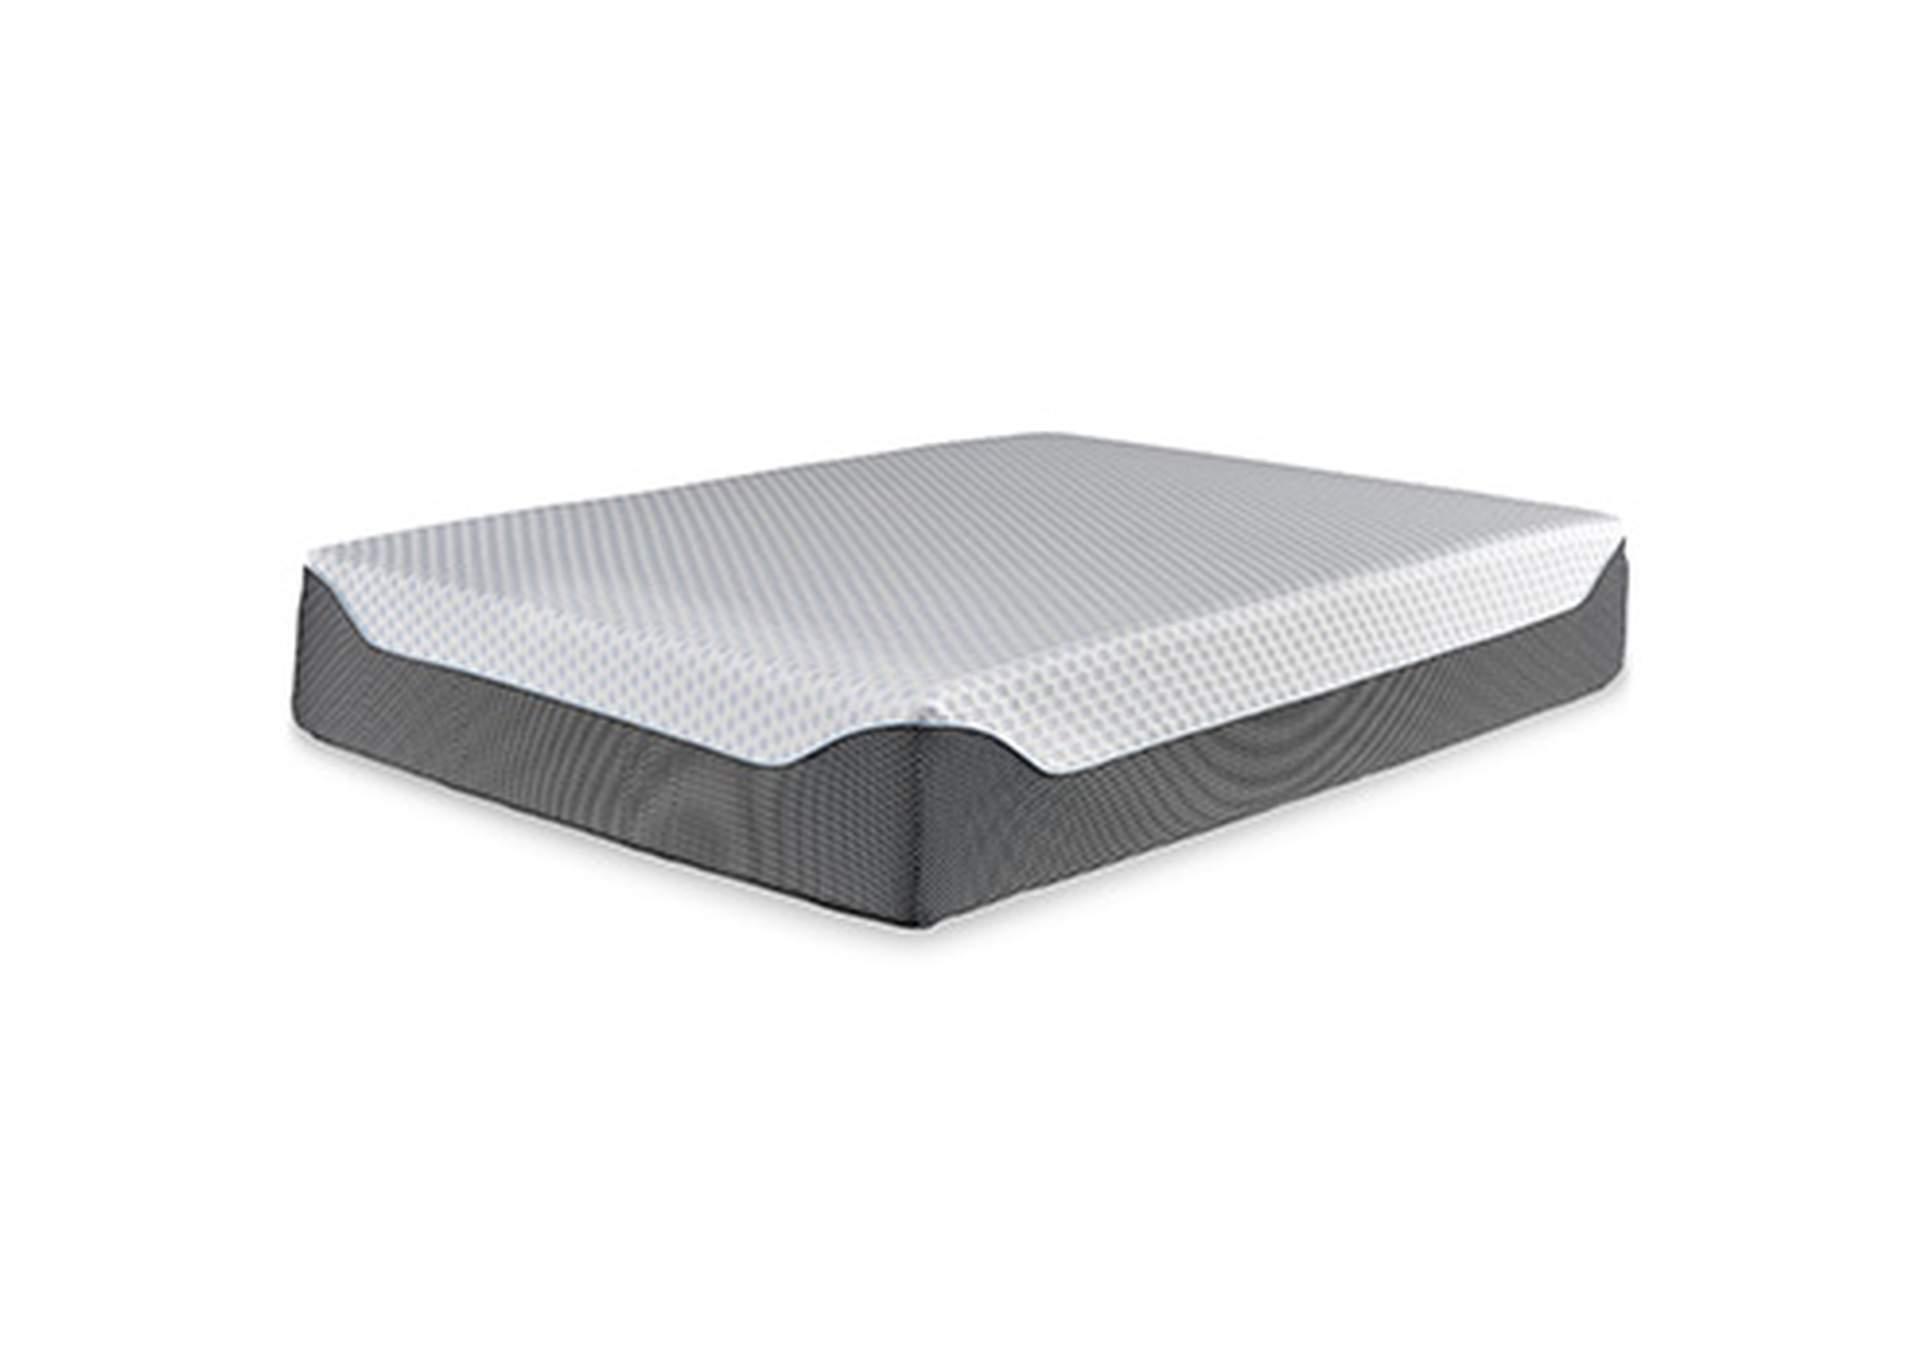 14 Inch Chime Elite King Memory Foam Mattress in a Box